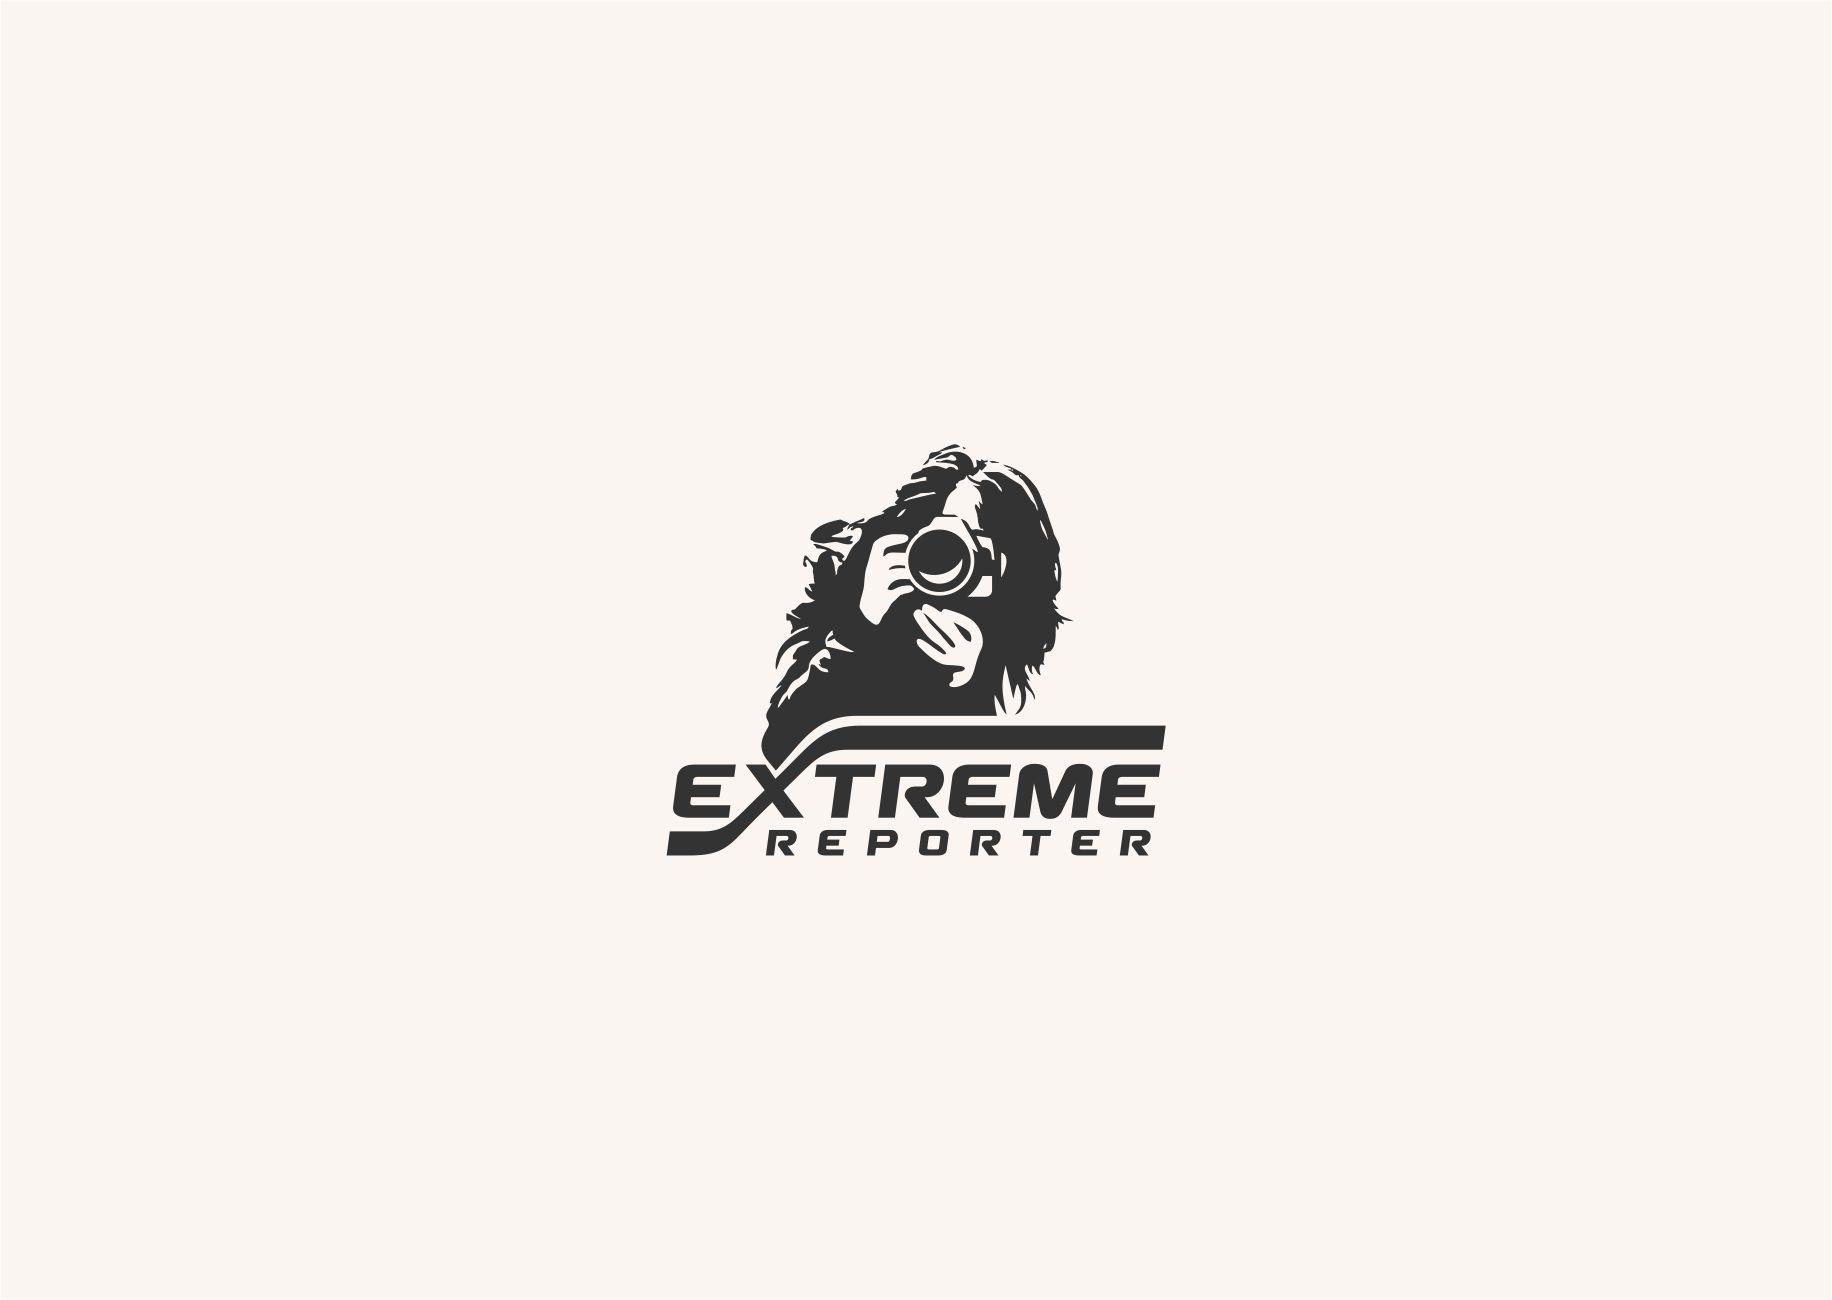 Логотип для экстрим фотографа.  фото f_3785a533f16304f7.jpg